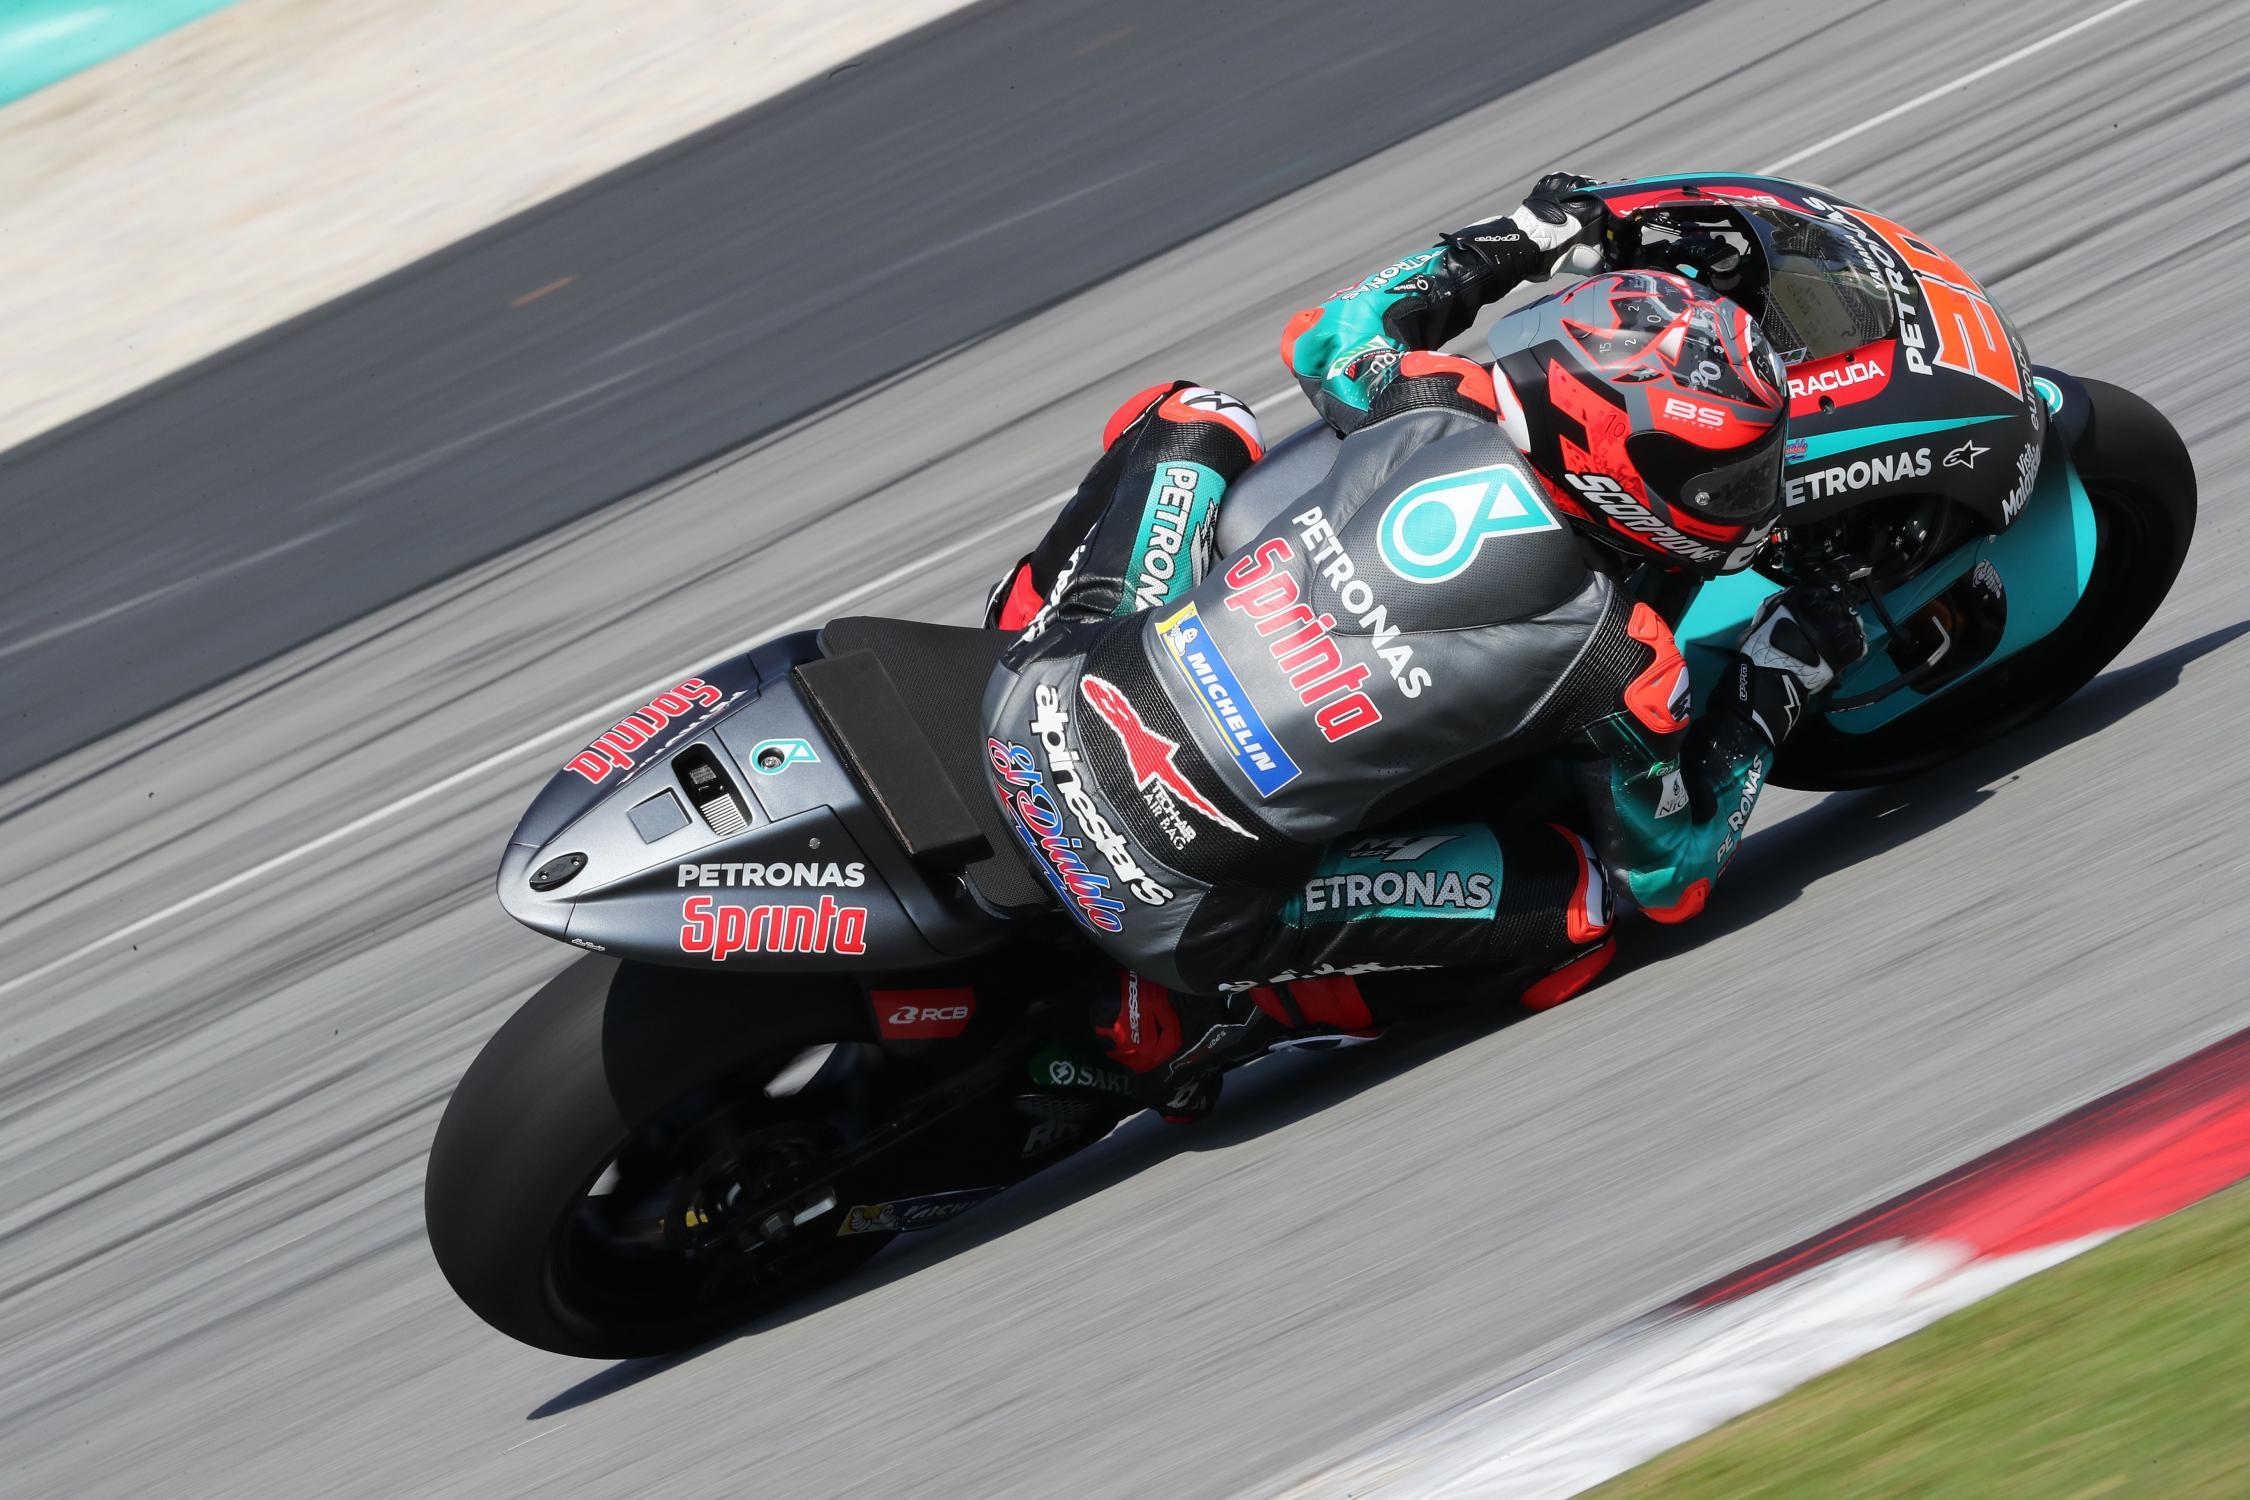 MOTO GP TESTS 2019 - Page 2 Fabio-quartararo-sepang-test-motogp-2019